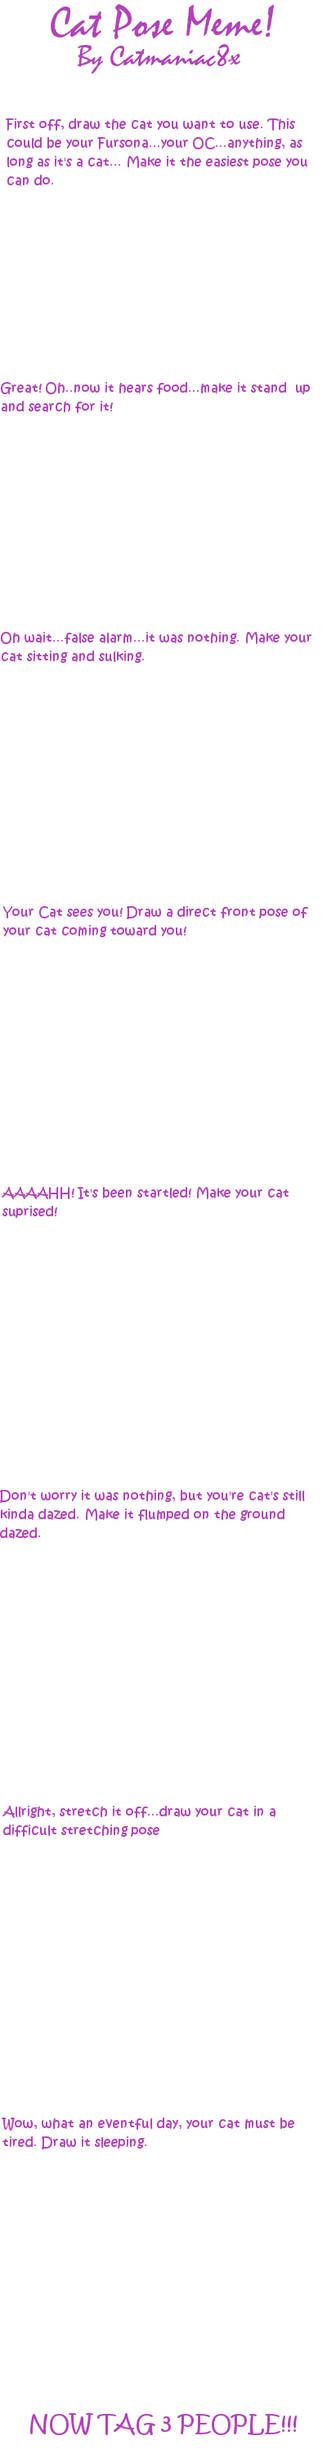 Cat Pose Meme Blank By Catmaniac8x Memes Art Memes Cat Pose